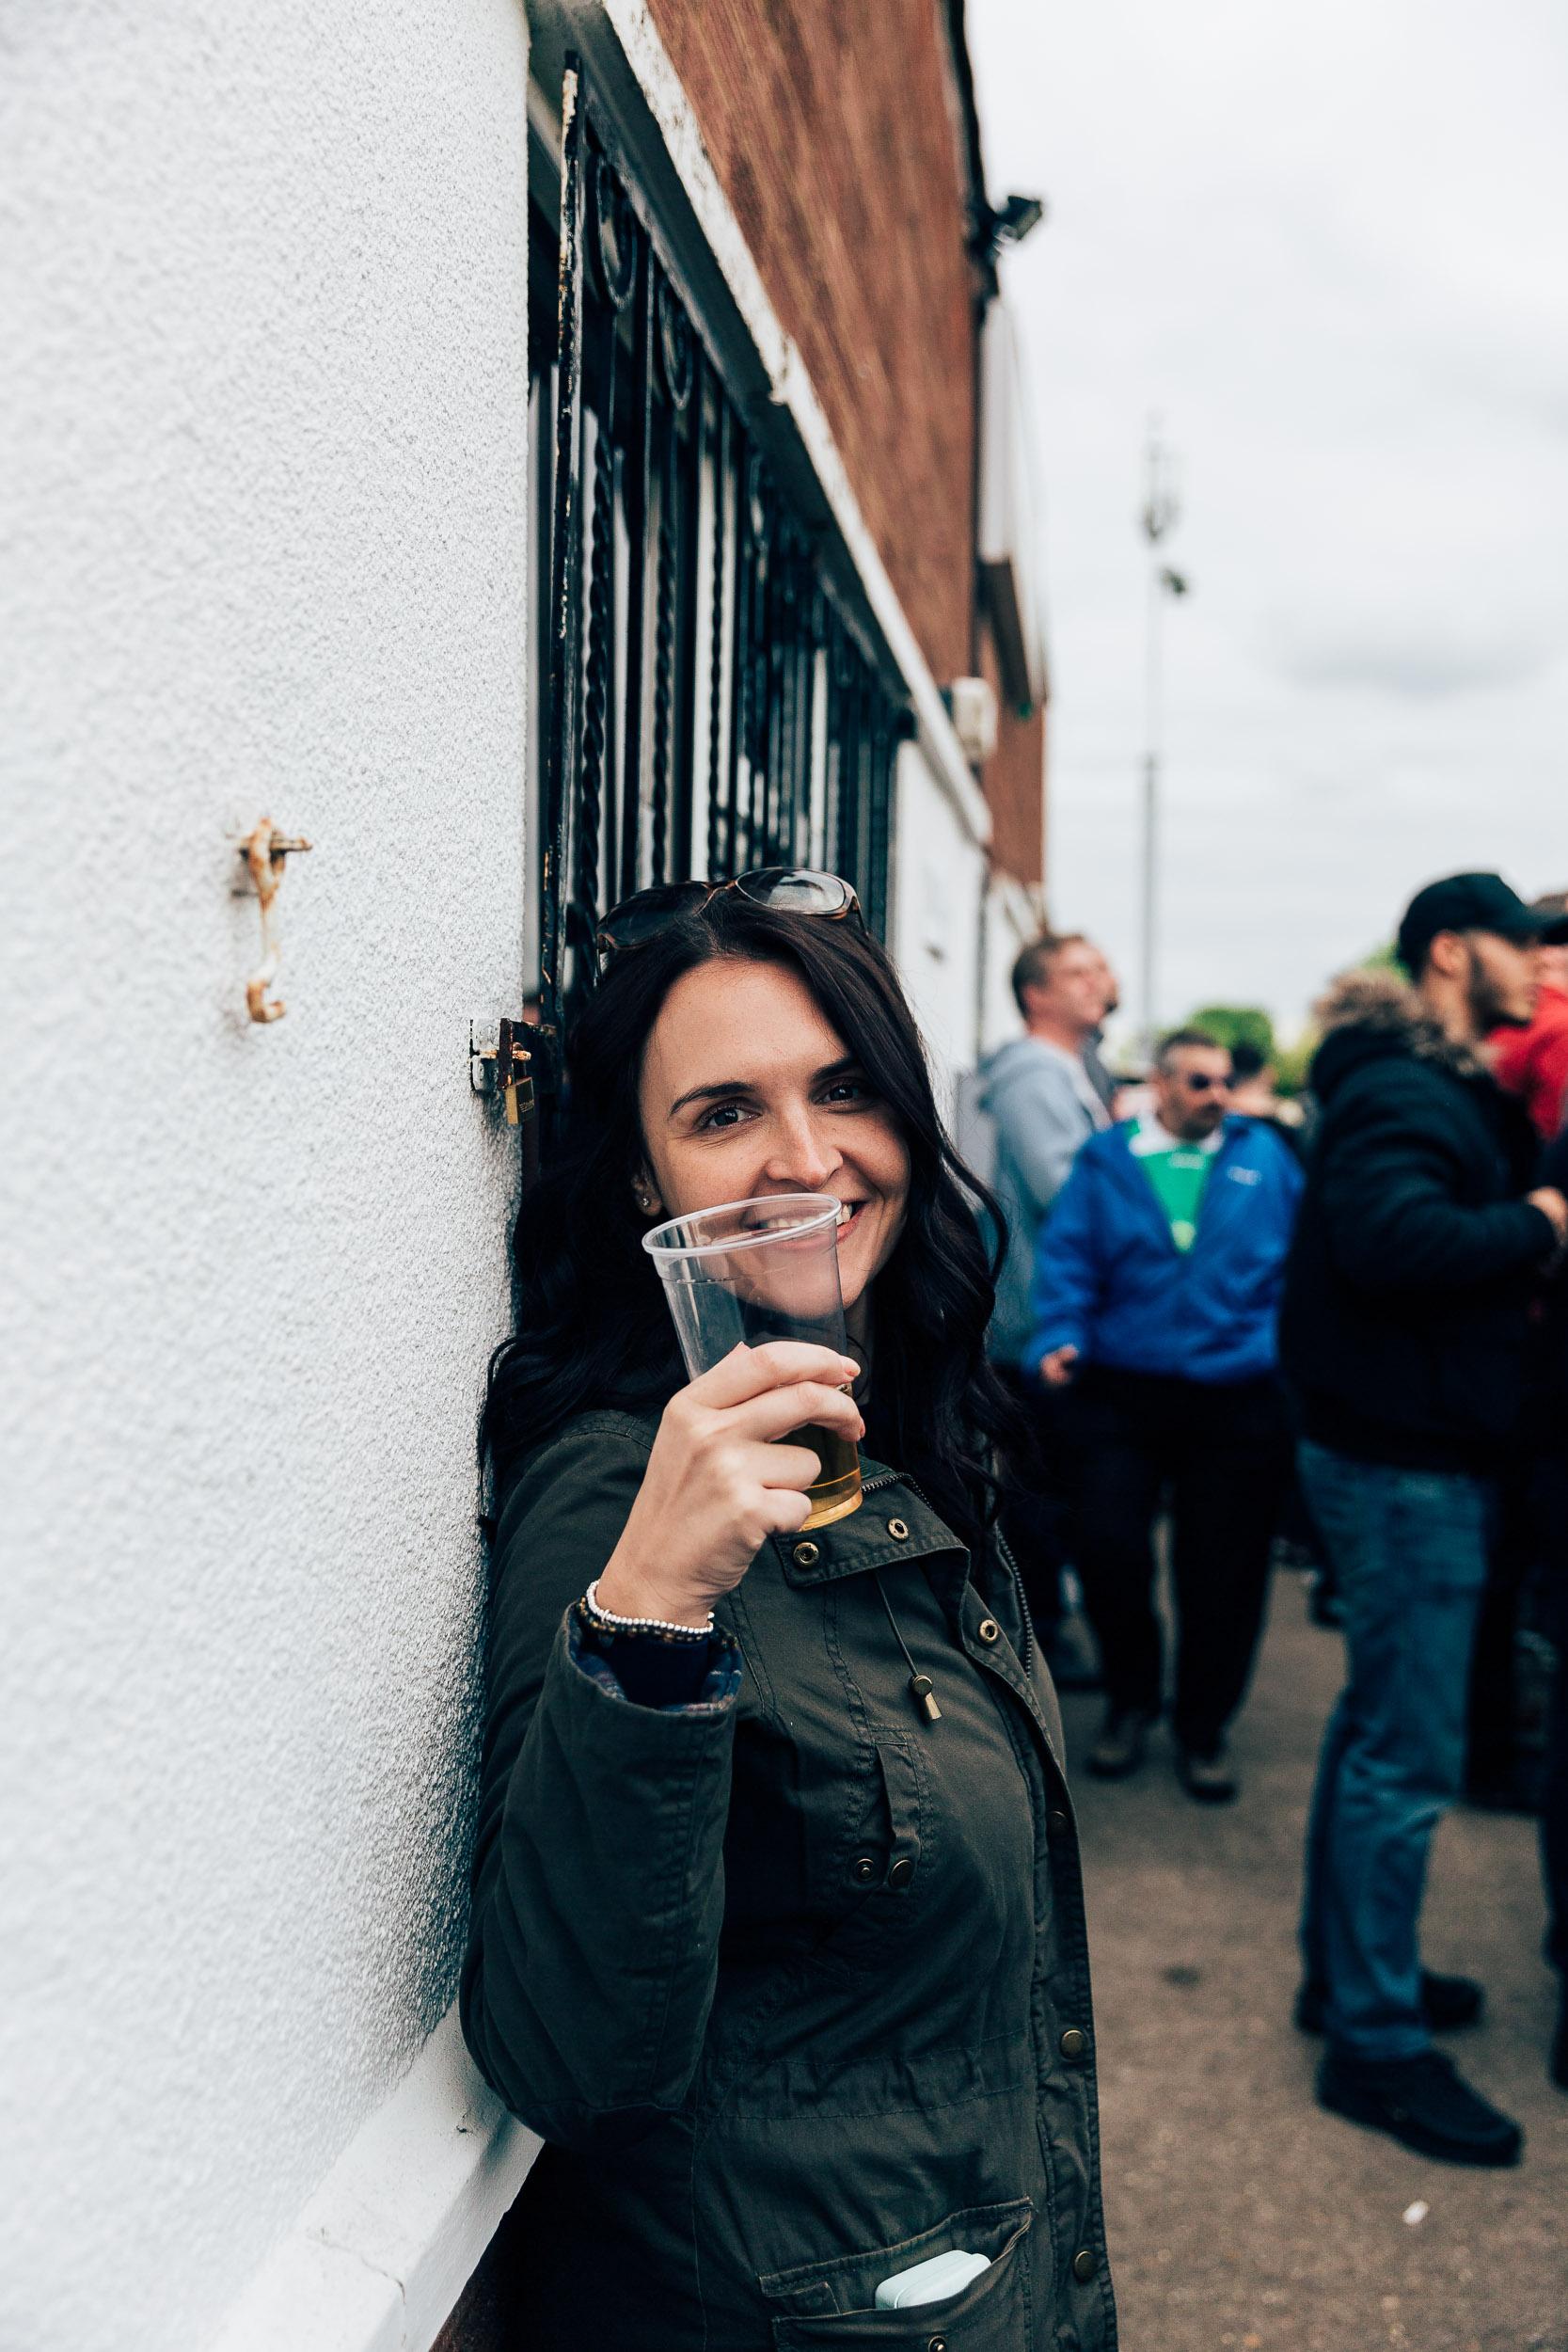 06_05_2019_Bromsgrove_Sporting_Corby-60.jpg